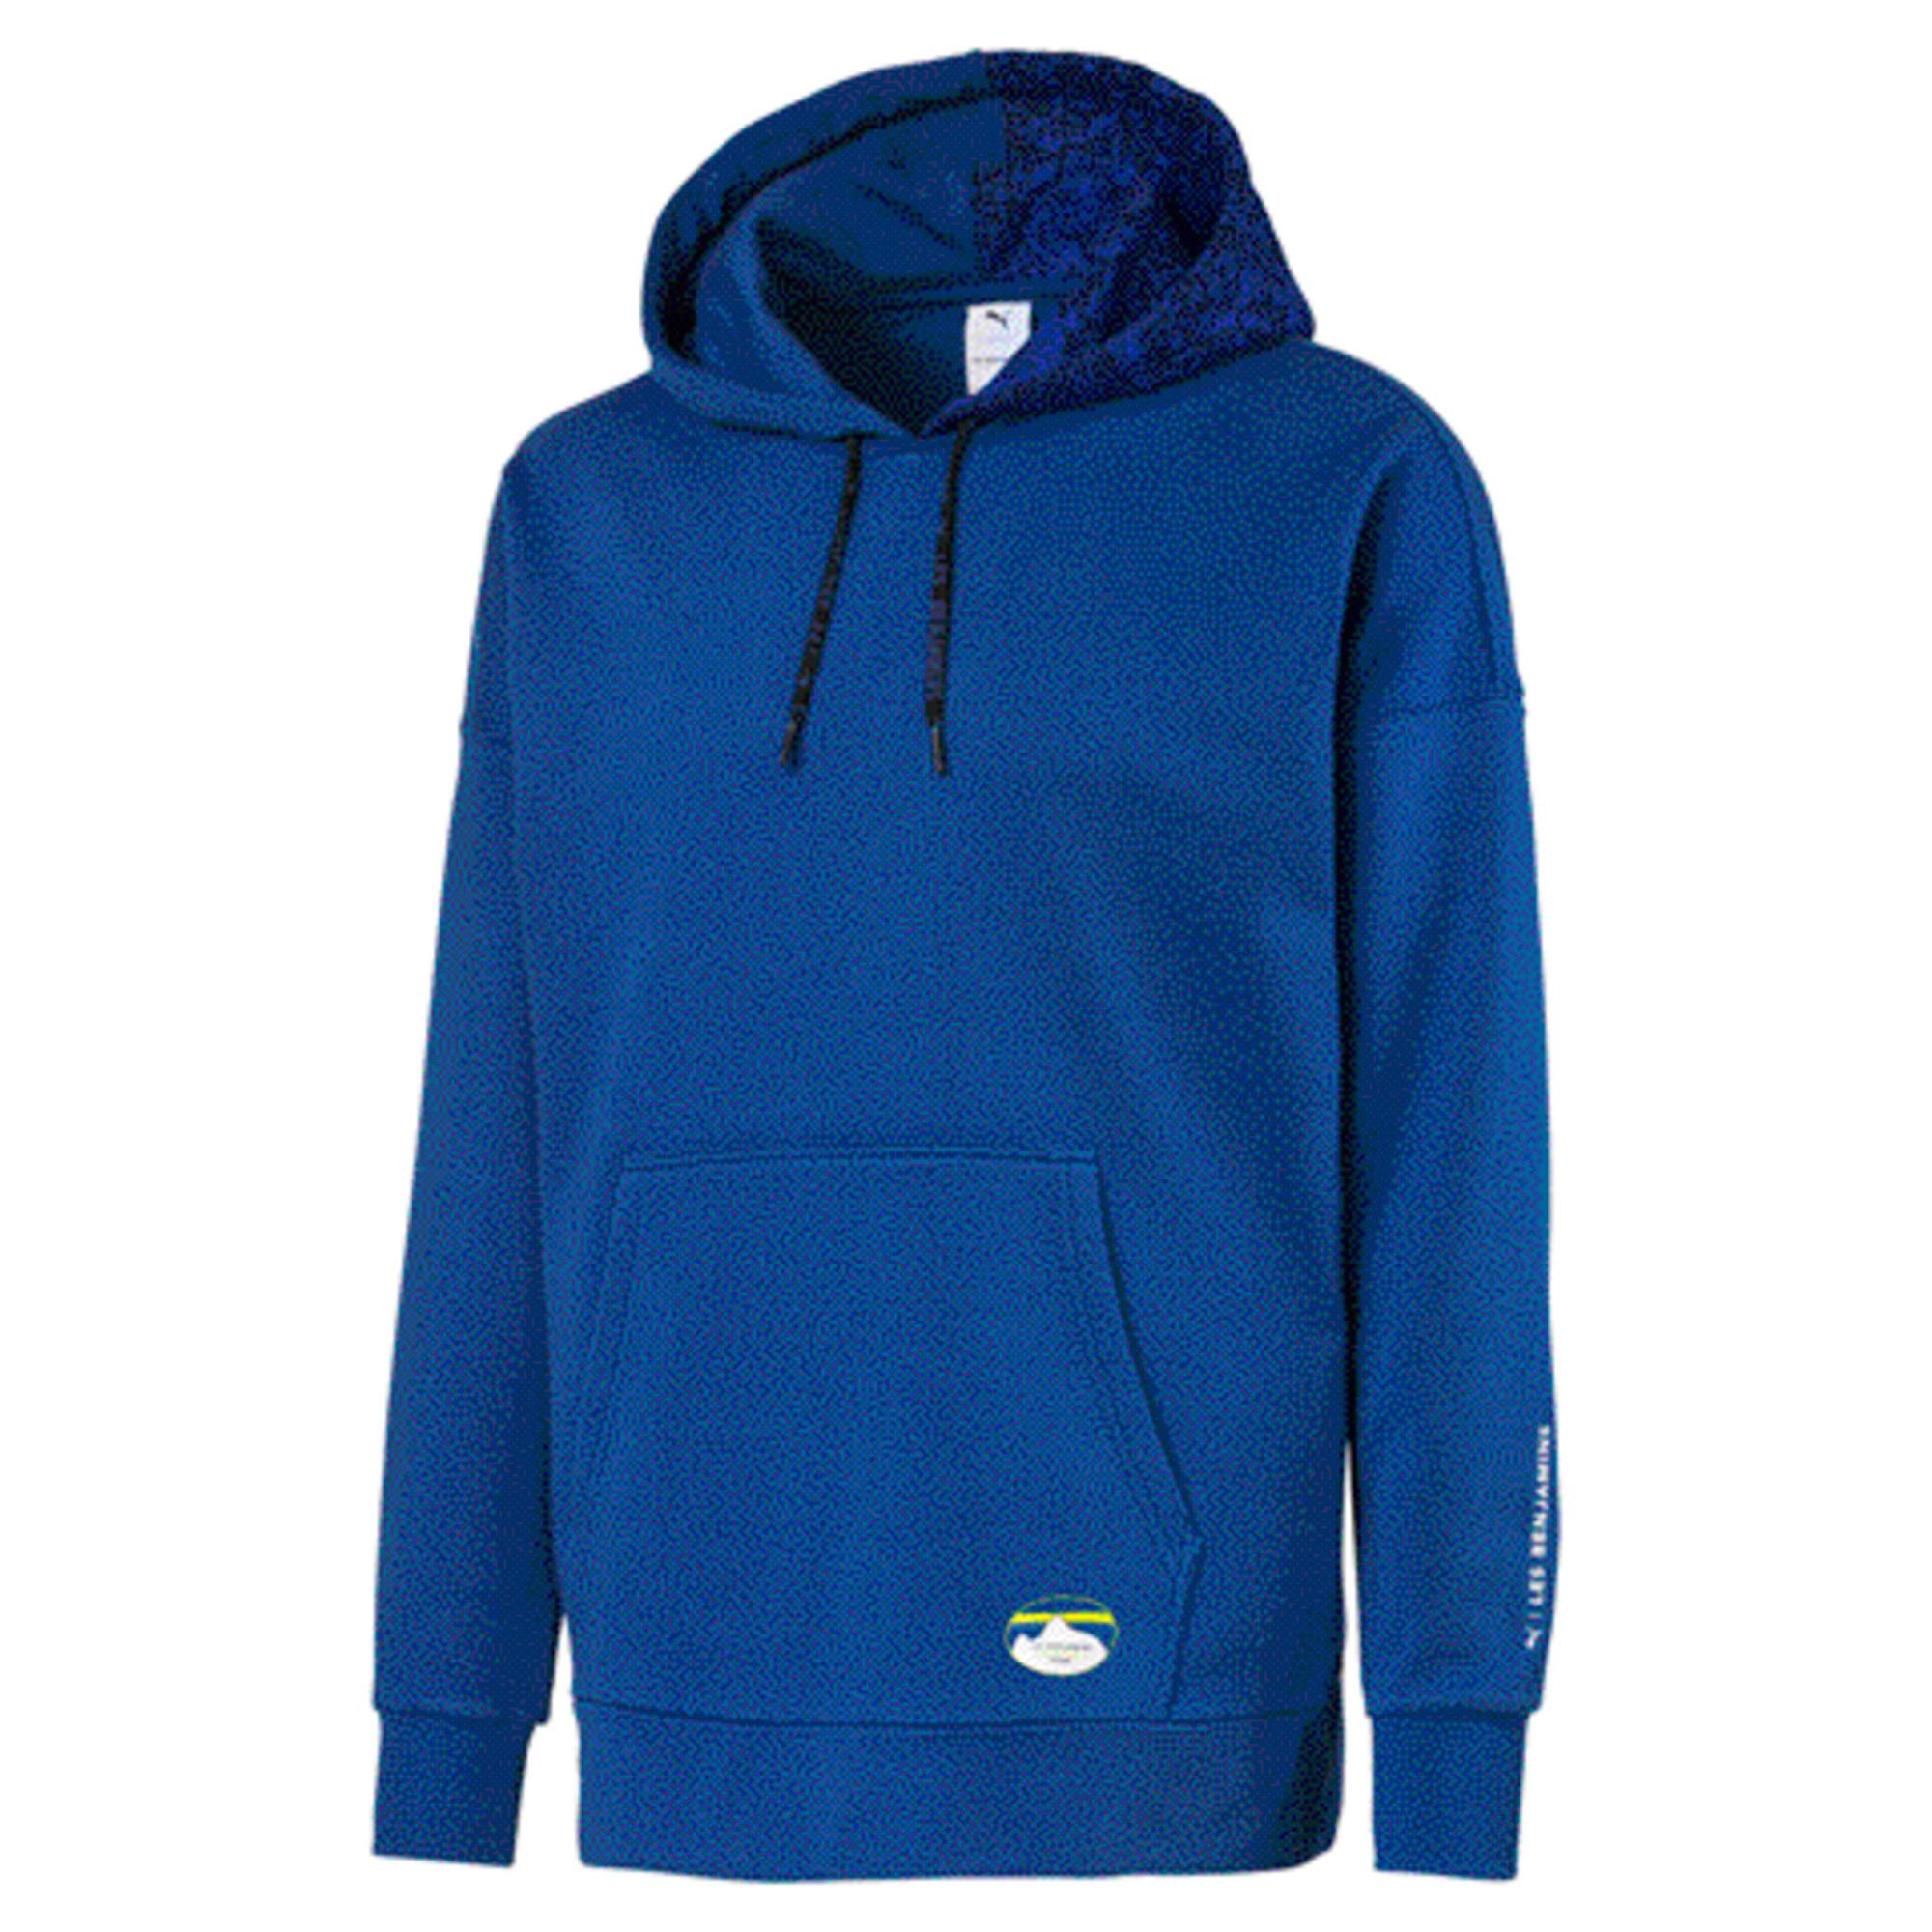 Miniatura 1 de Sudadera con capucha PUMA x LES BENJAMINS para hombre, Galaxy Blue, mediano